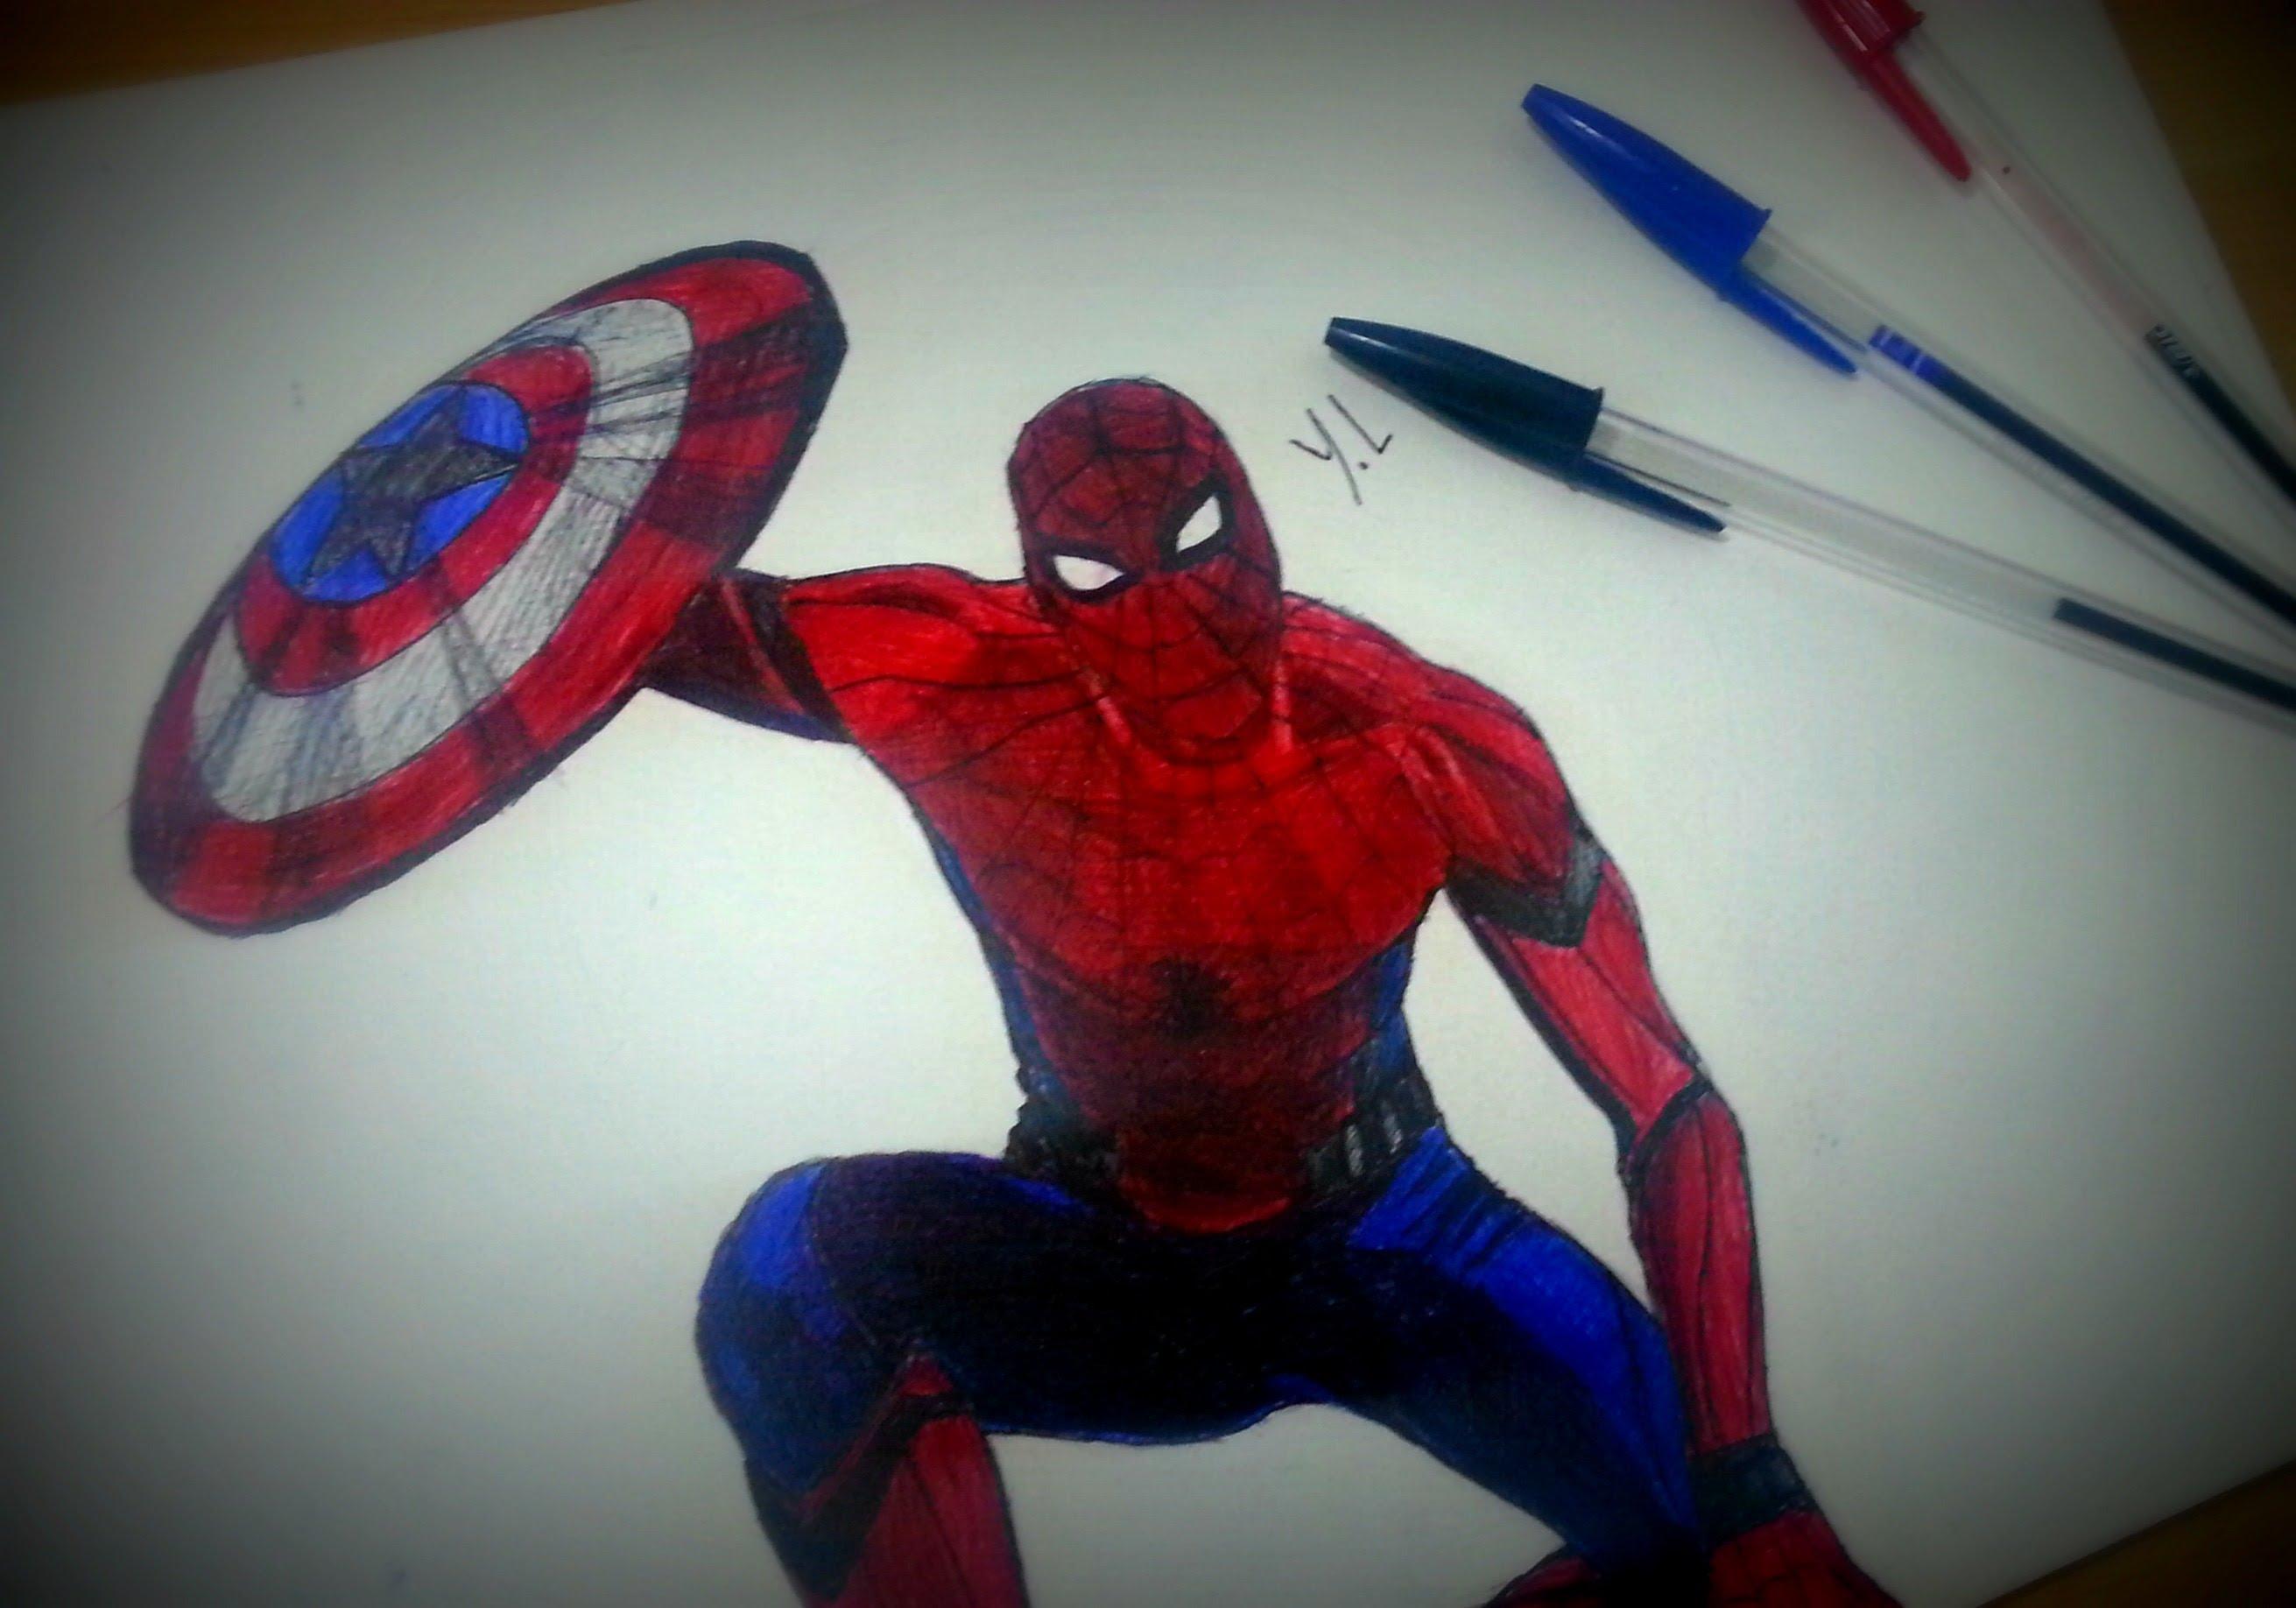 2622x1836 Spiderman Drawing In Ballpoint Pen